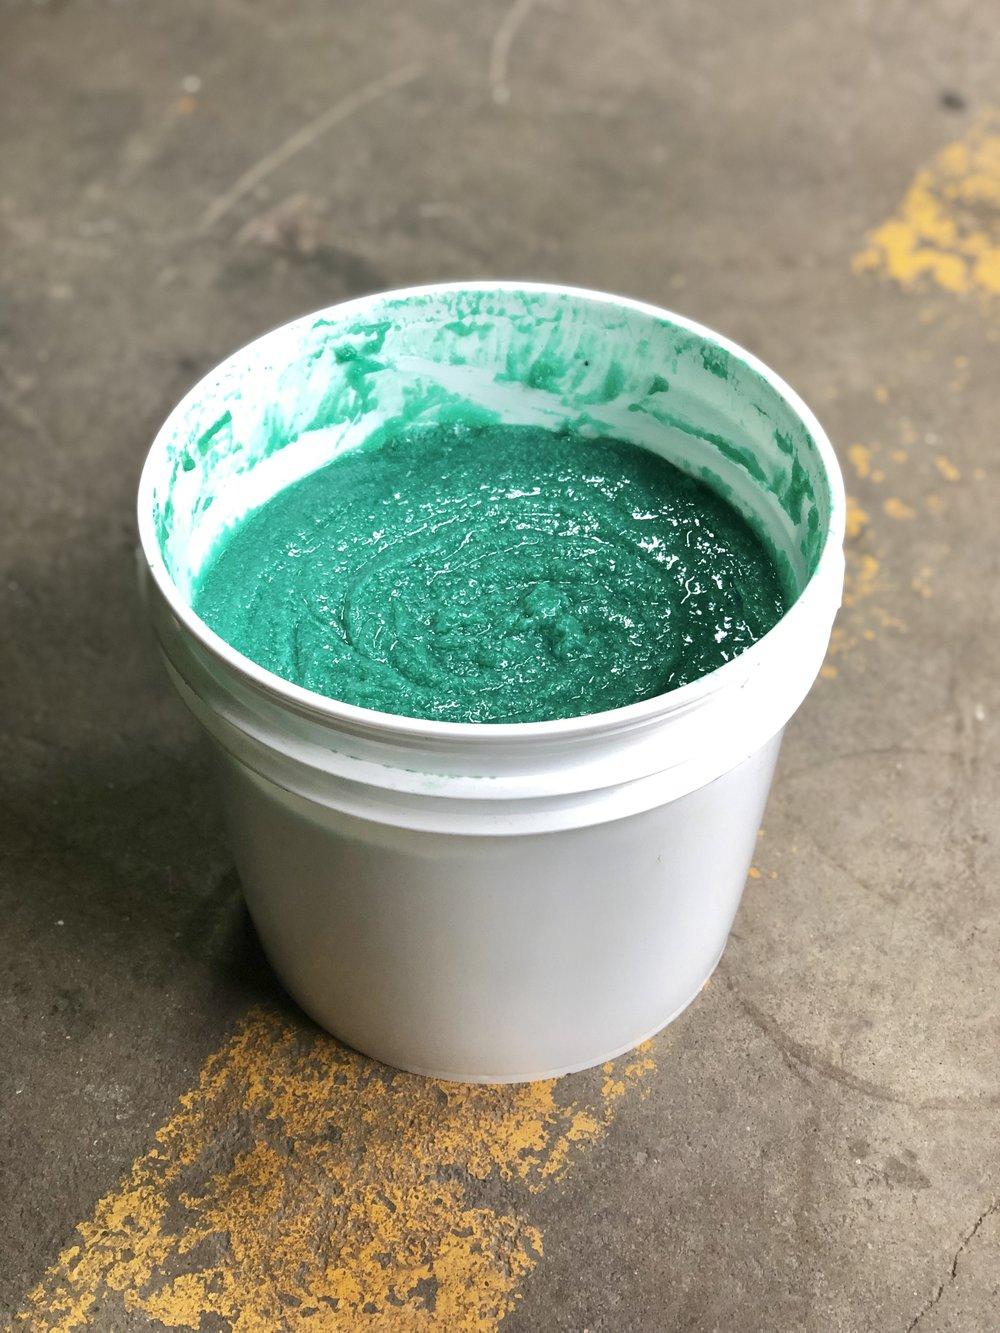 apdat-print-co-green-cleaning-sgreen-ryonet.jpg